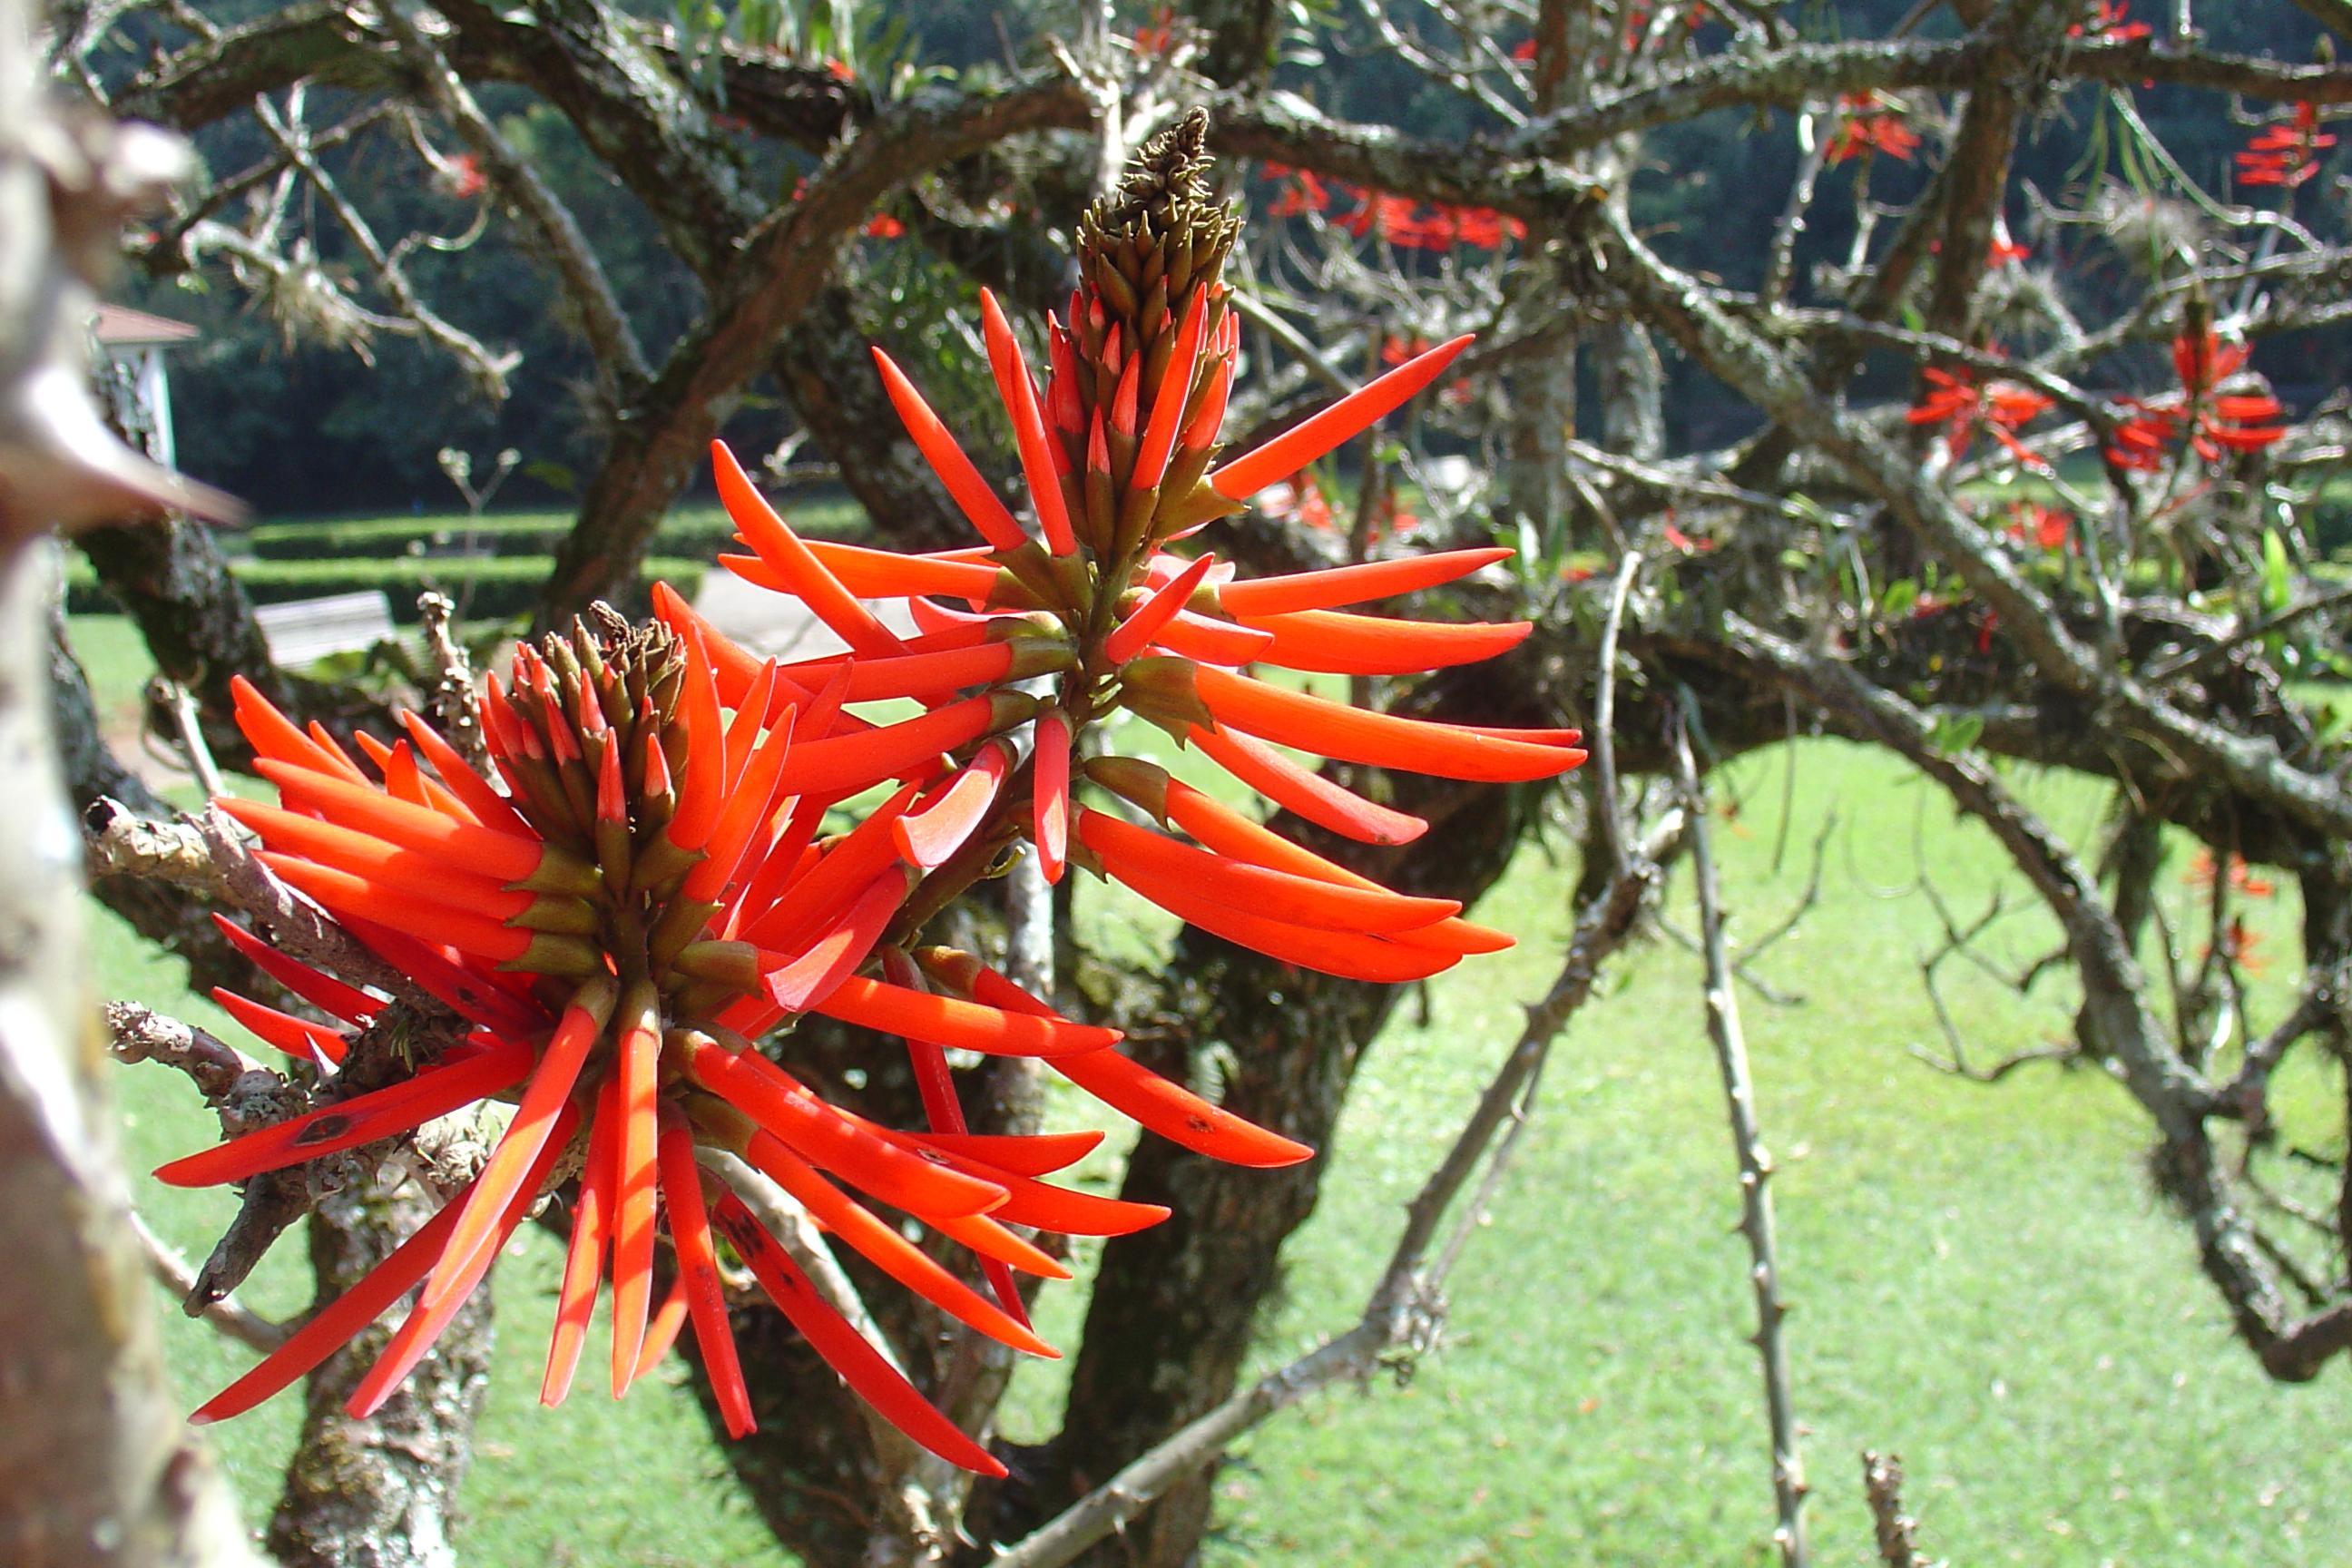 ipe de jardim botânico:Ah inverno…